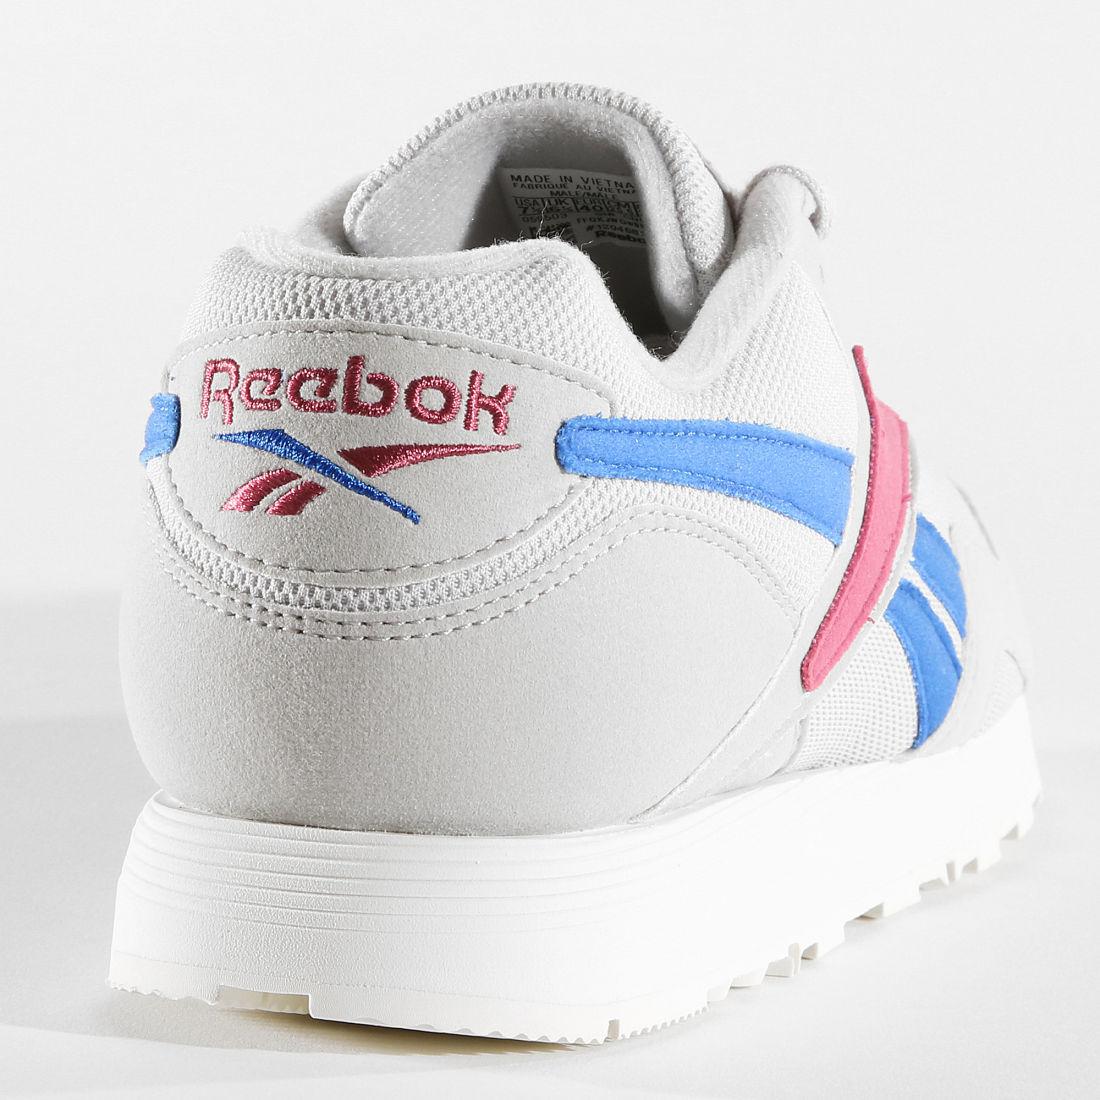 Baskets Reebok Rapide MU CN5911 Reebok | Brutalzapas